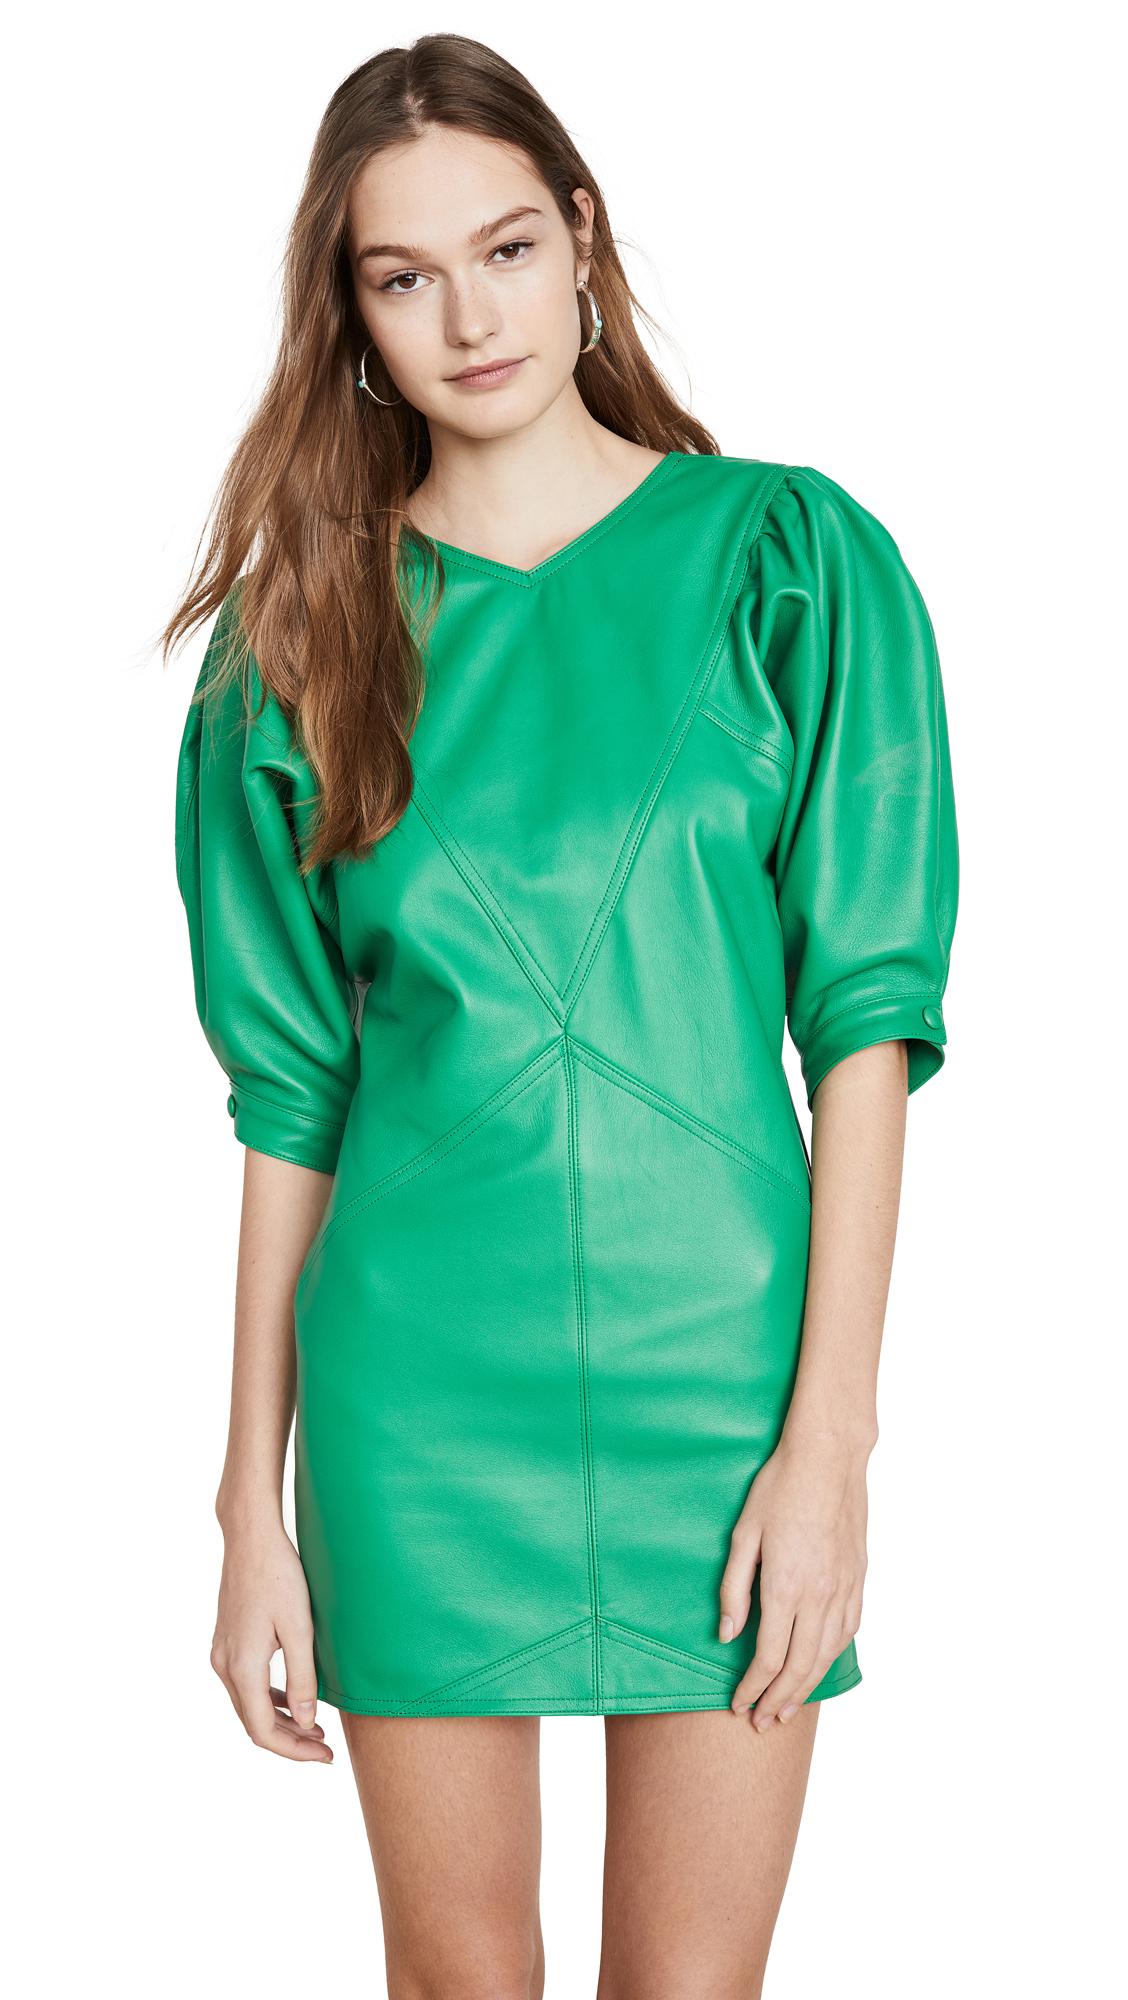 Isabel Marant Xadela Dress - 40% Off Sale